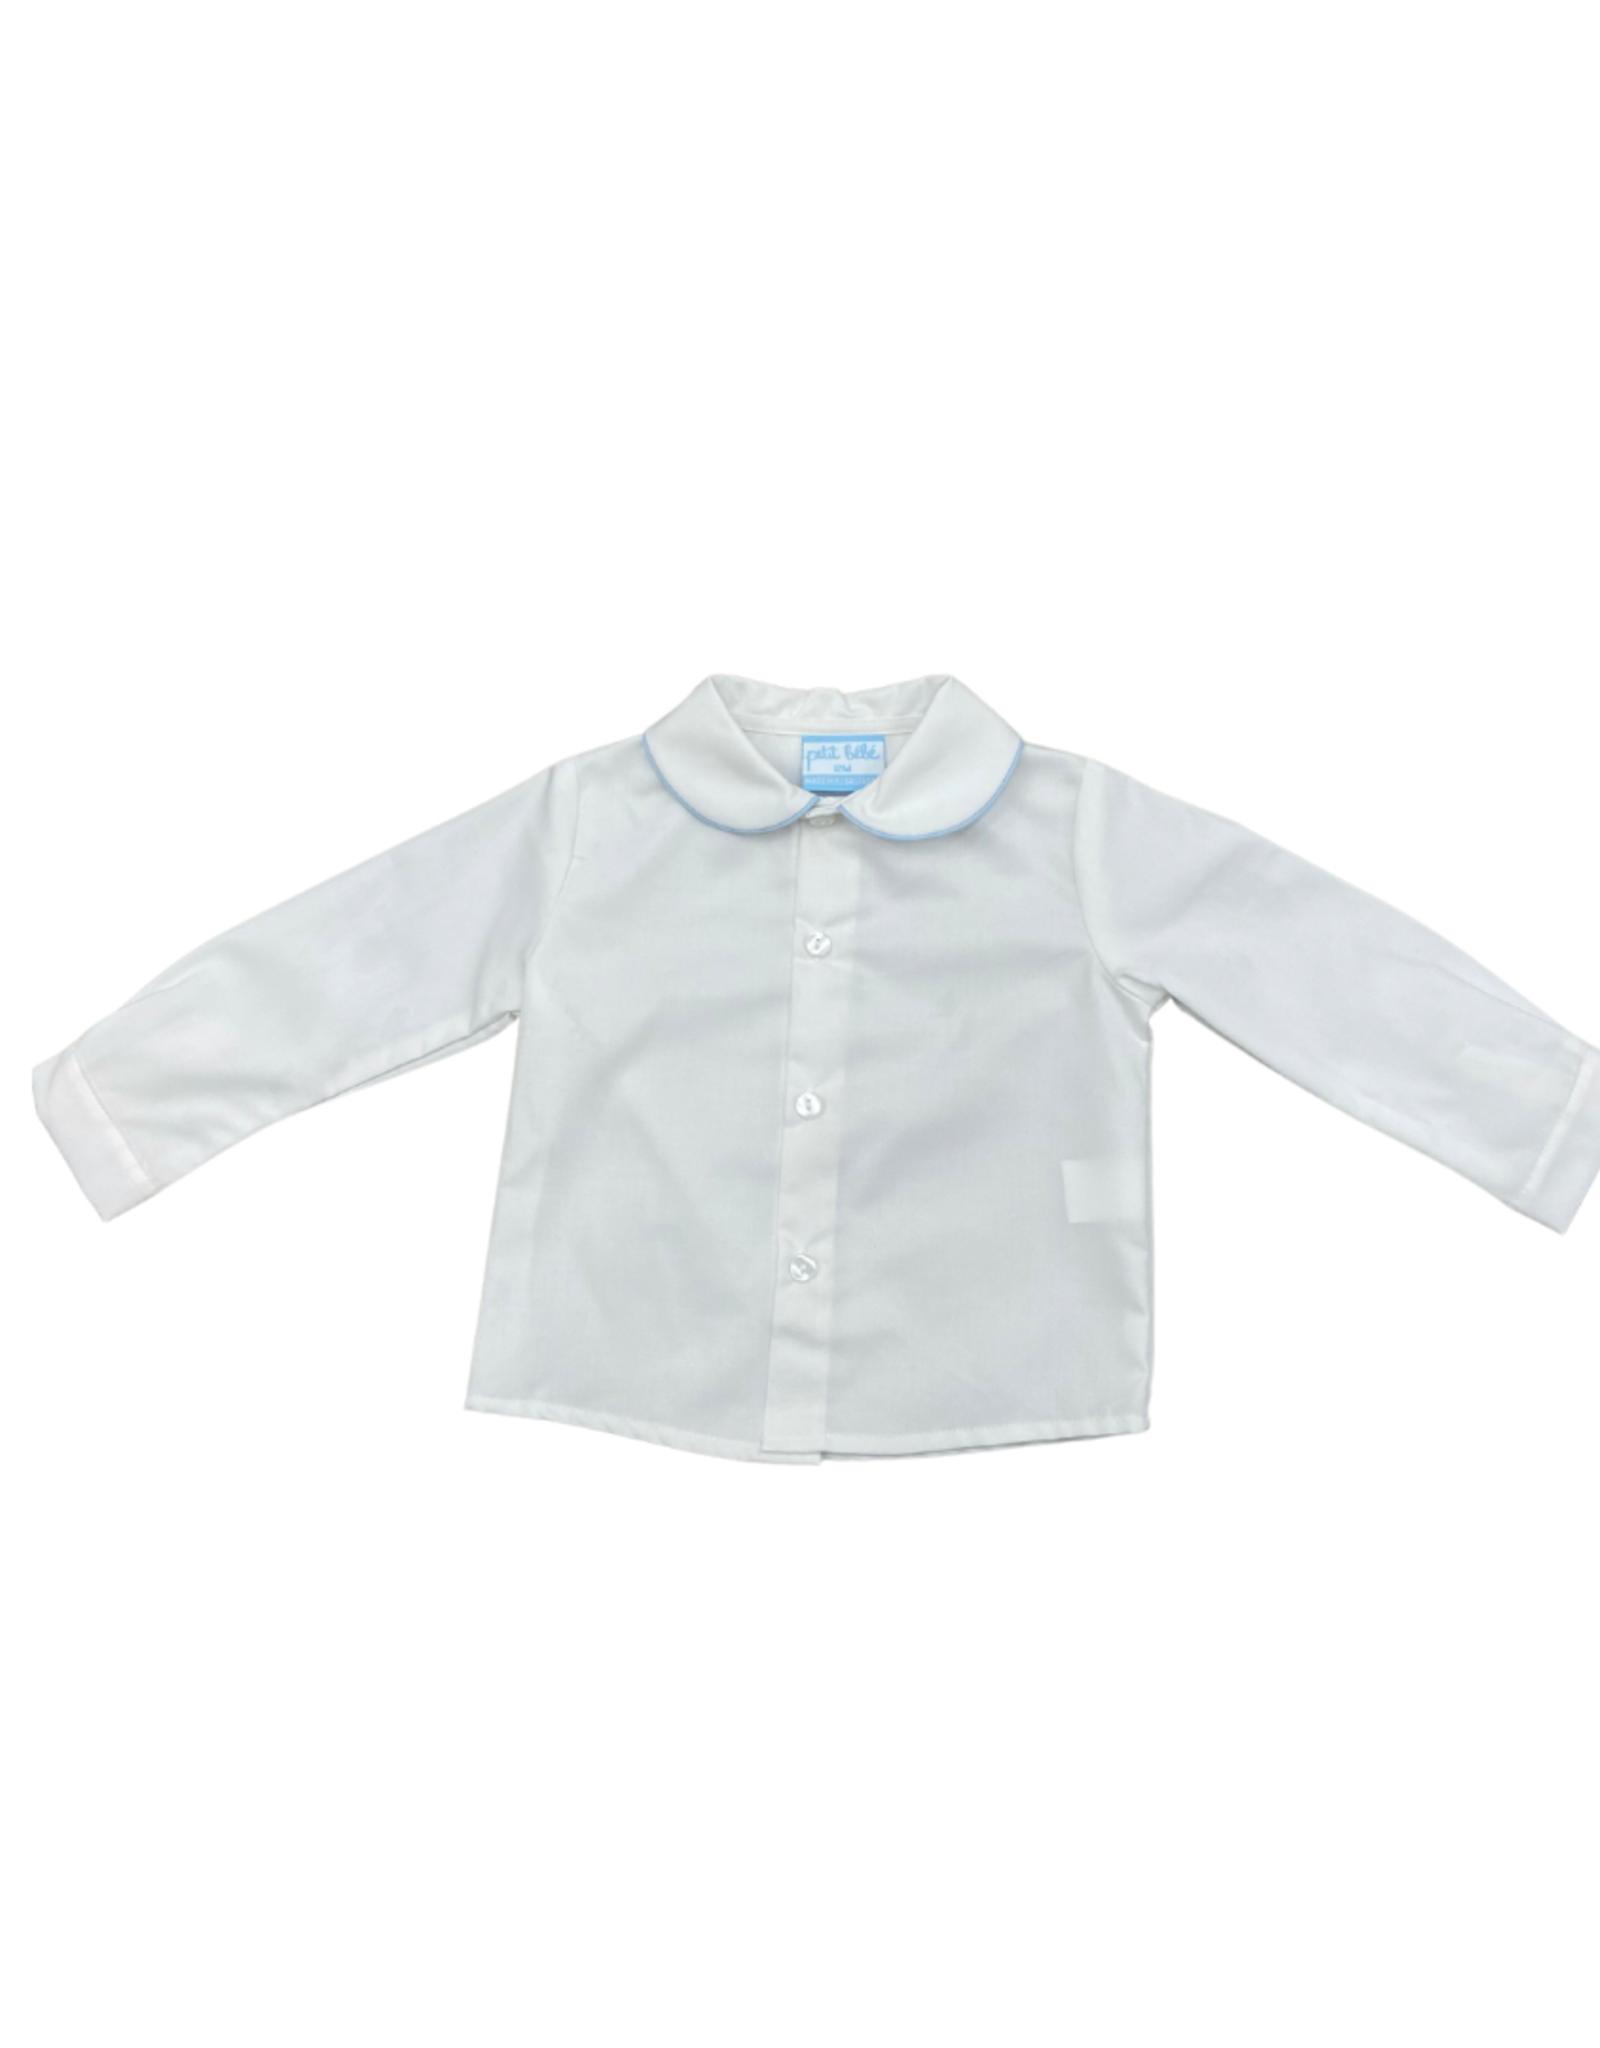 Petit Bebe Boys White Shirt w/ Lt Blue Piping